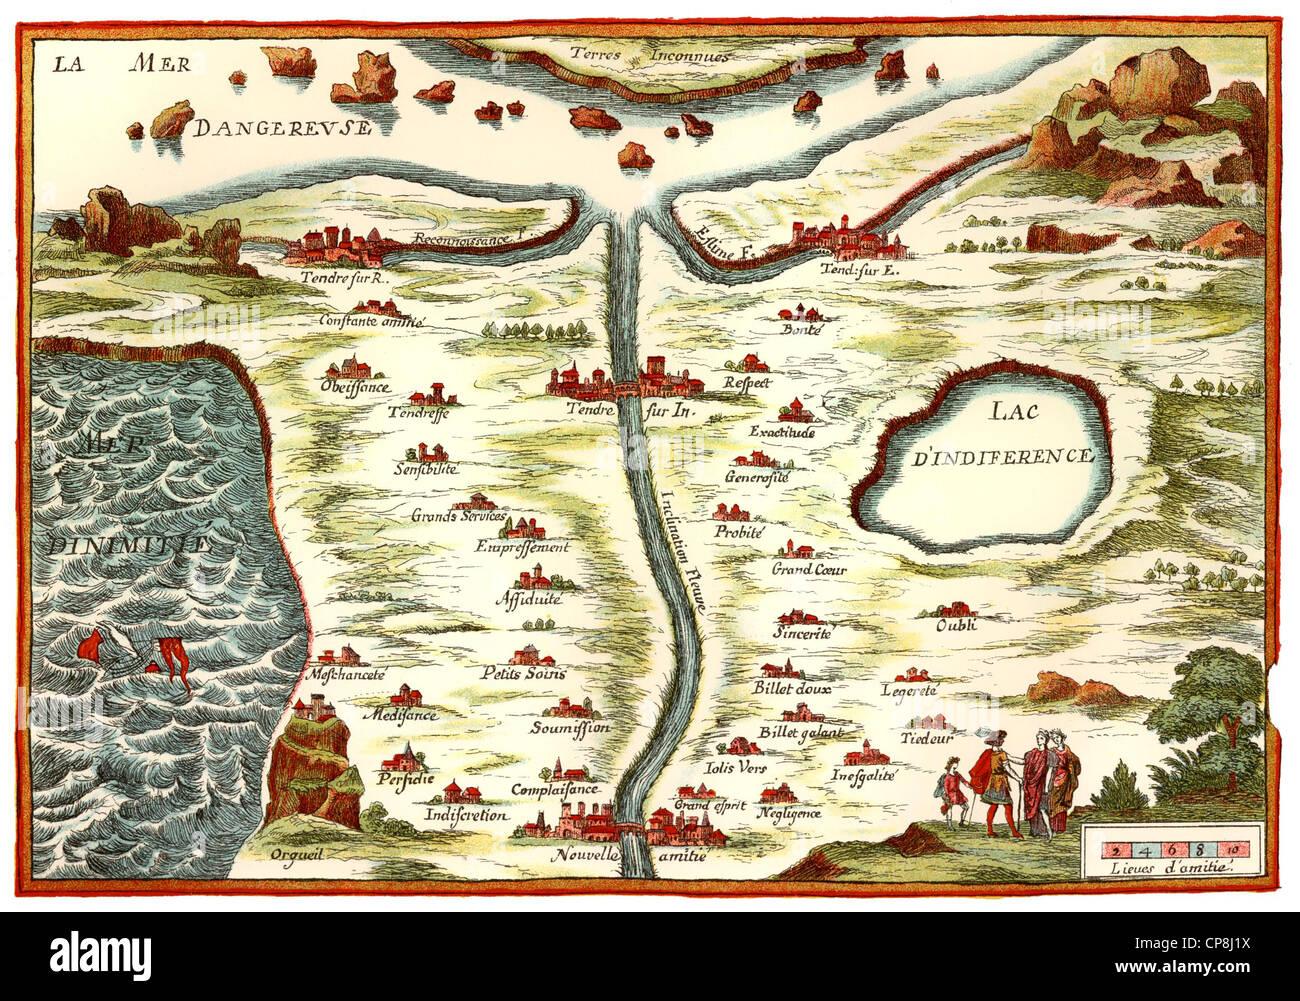 la carte de tendre map of love, Carte de Tendre map from the novel Clélie by